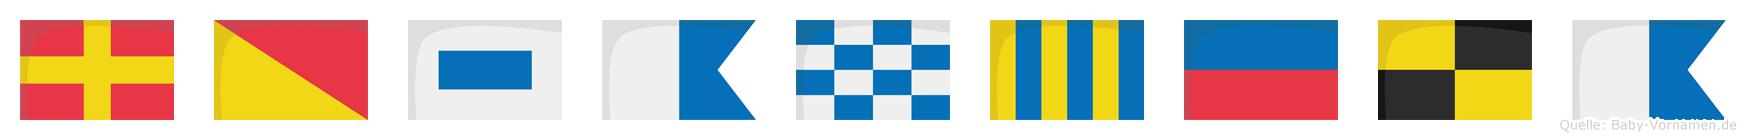 Rosangela im Flaggenalphabet